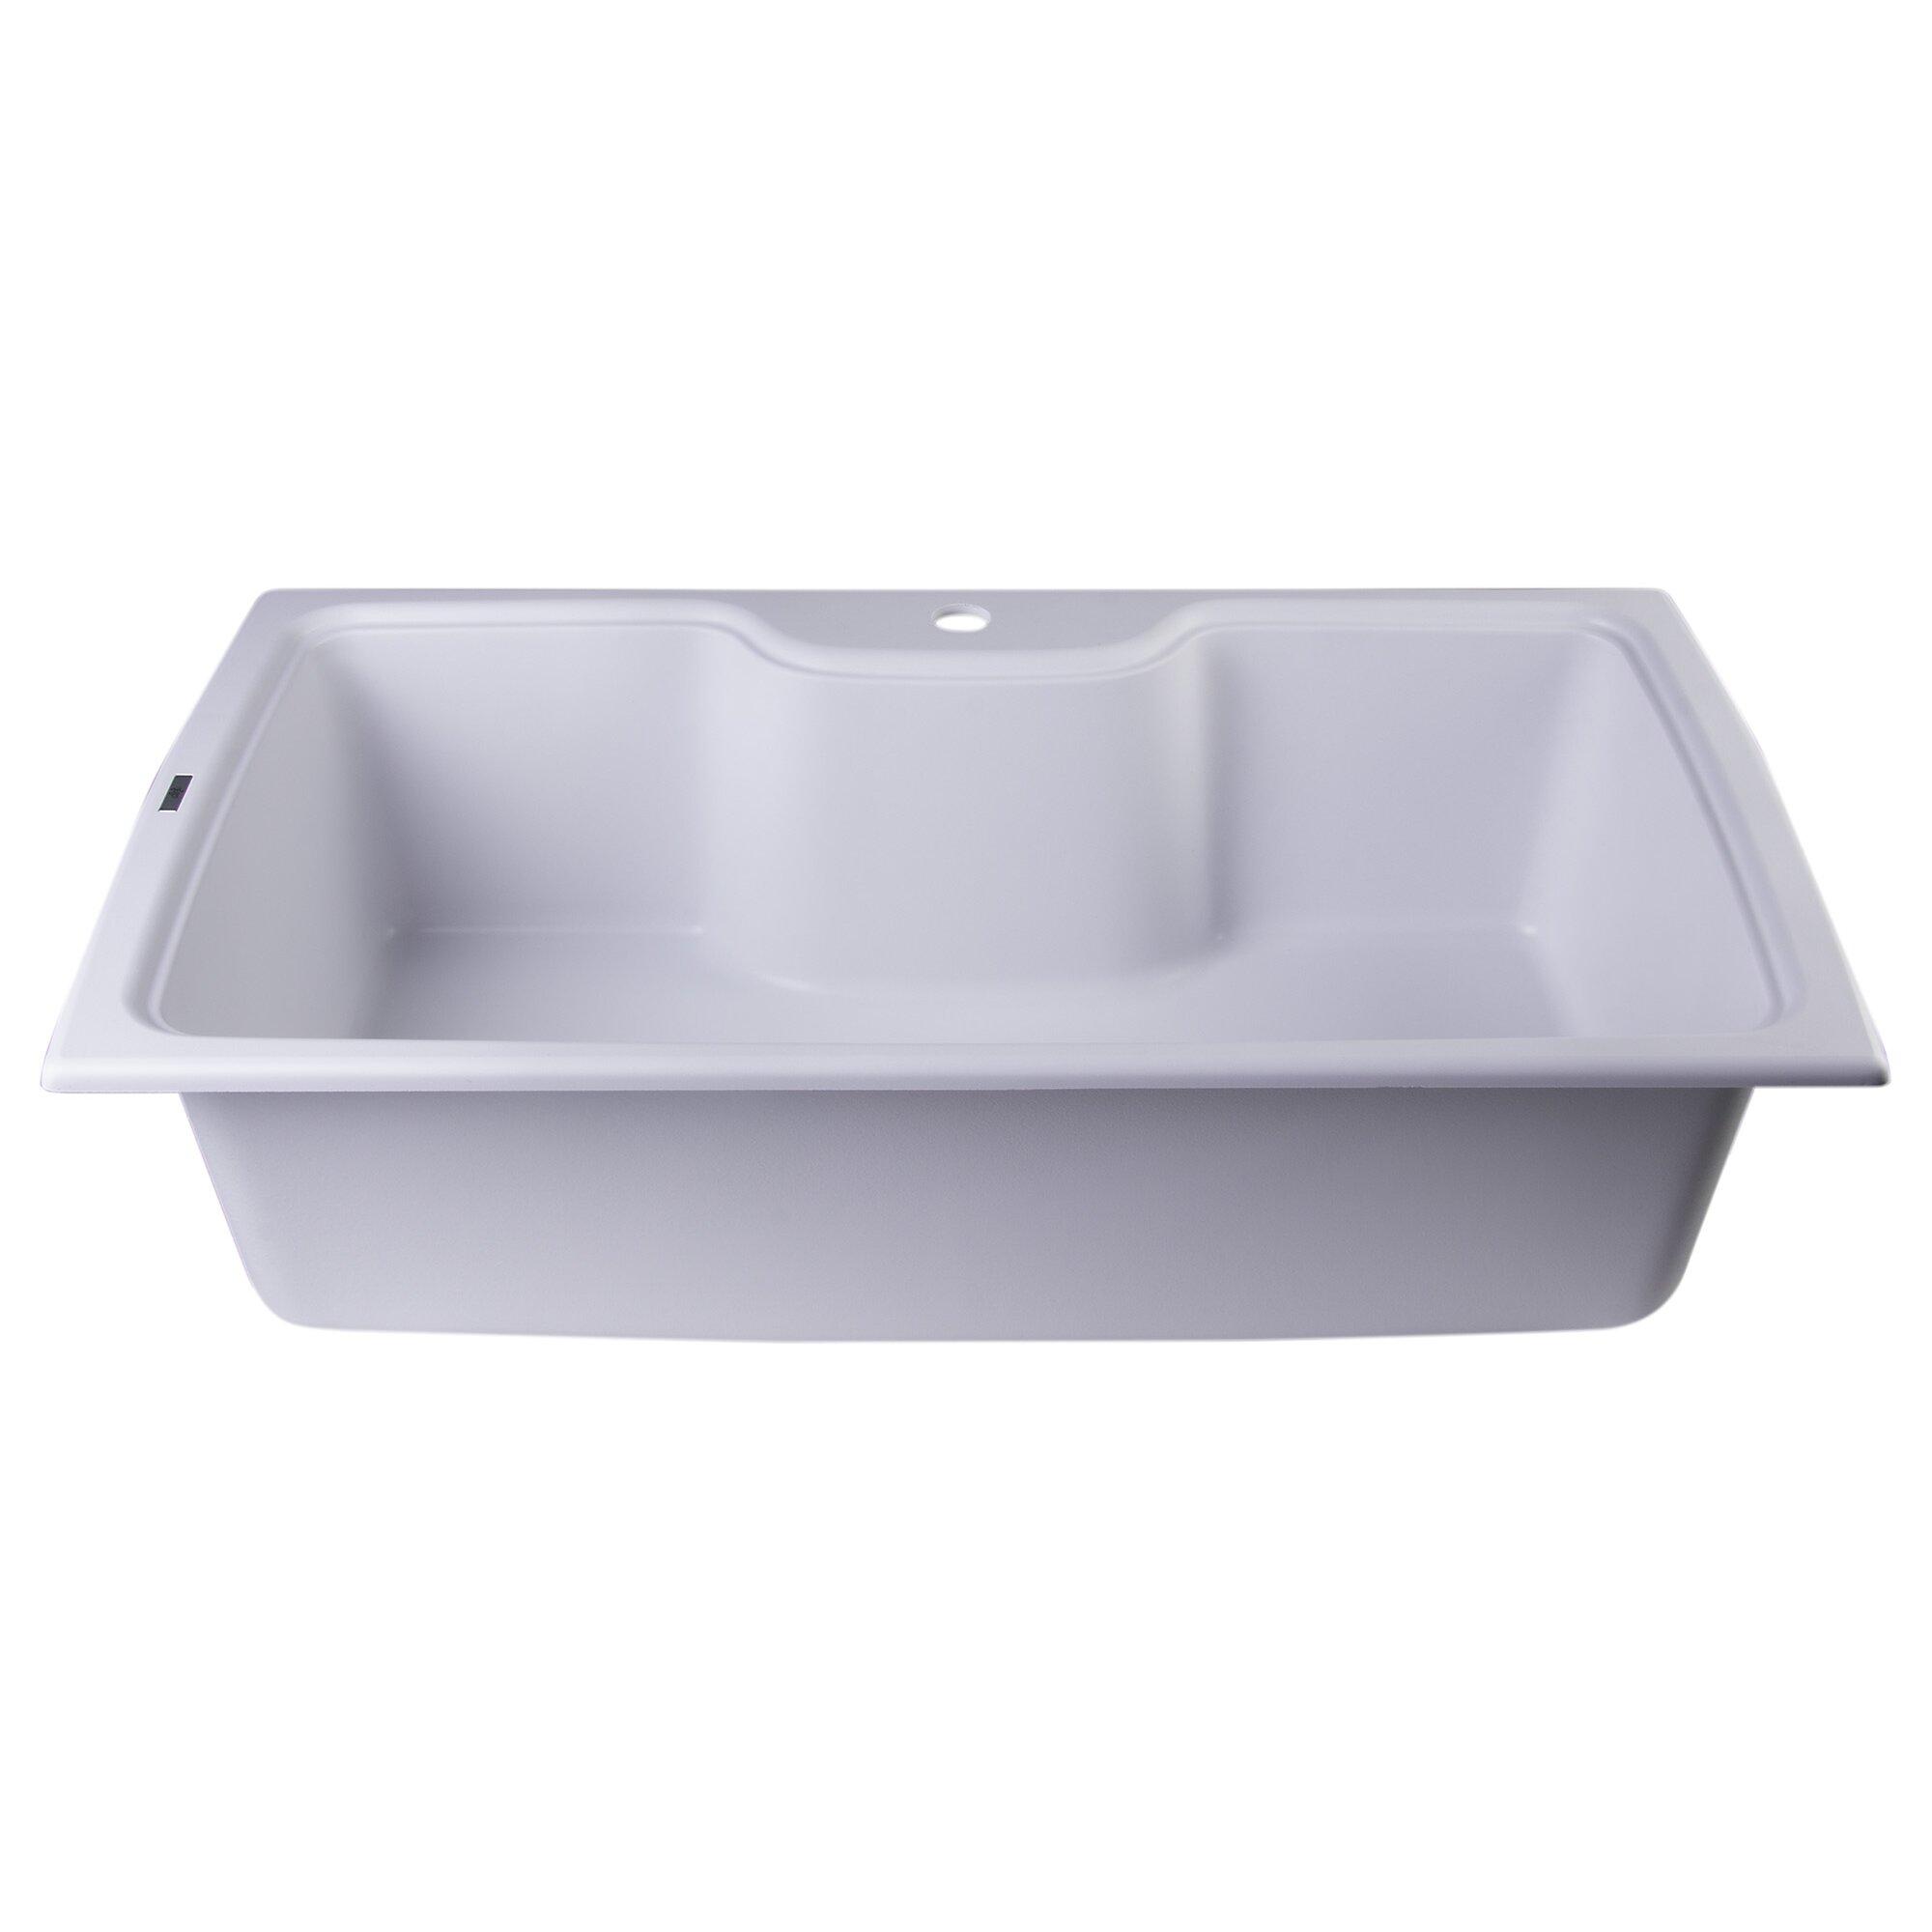 "Alfi Brand 34.63"" X 19.69"" Drop-In Single Bowl Kitchen"